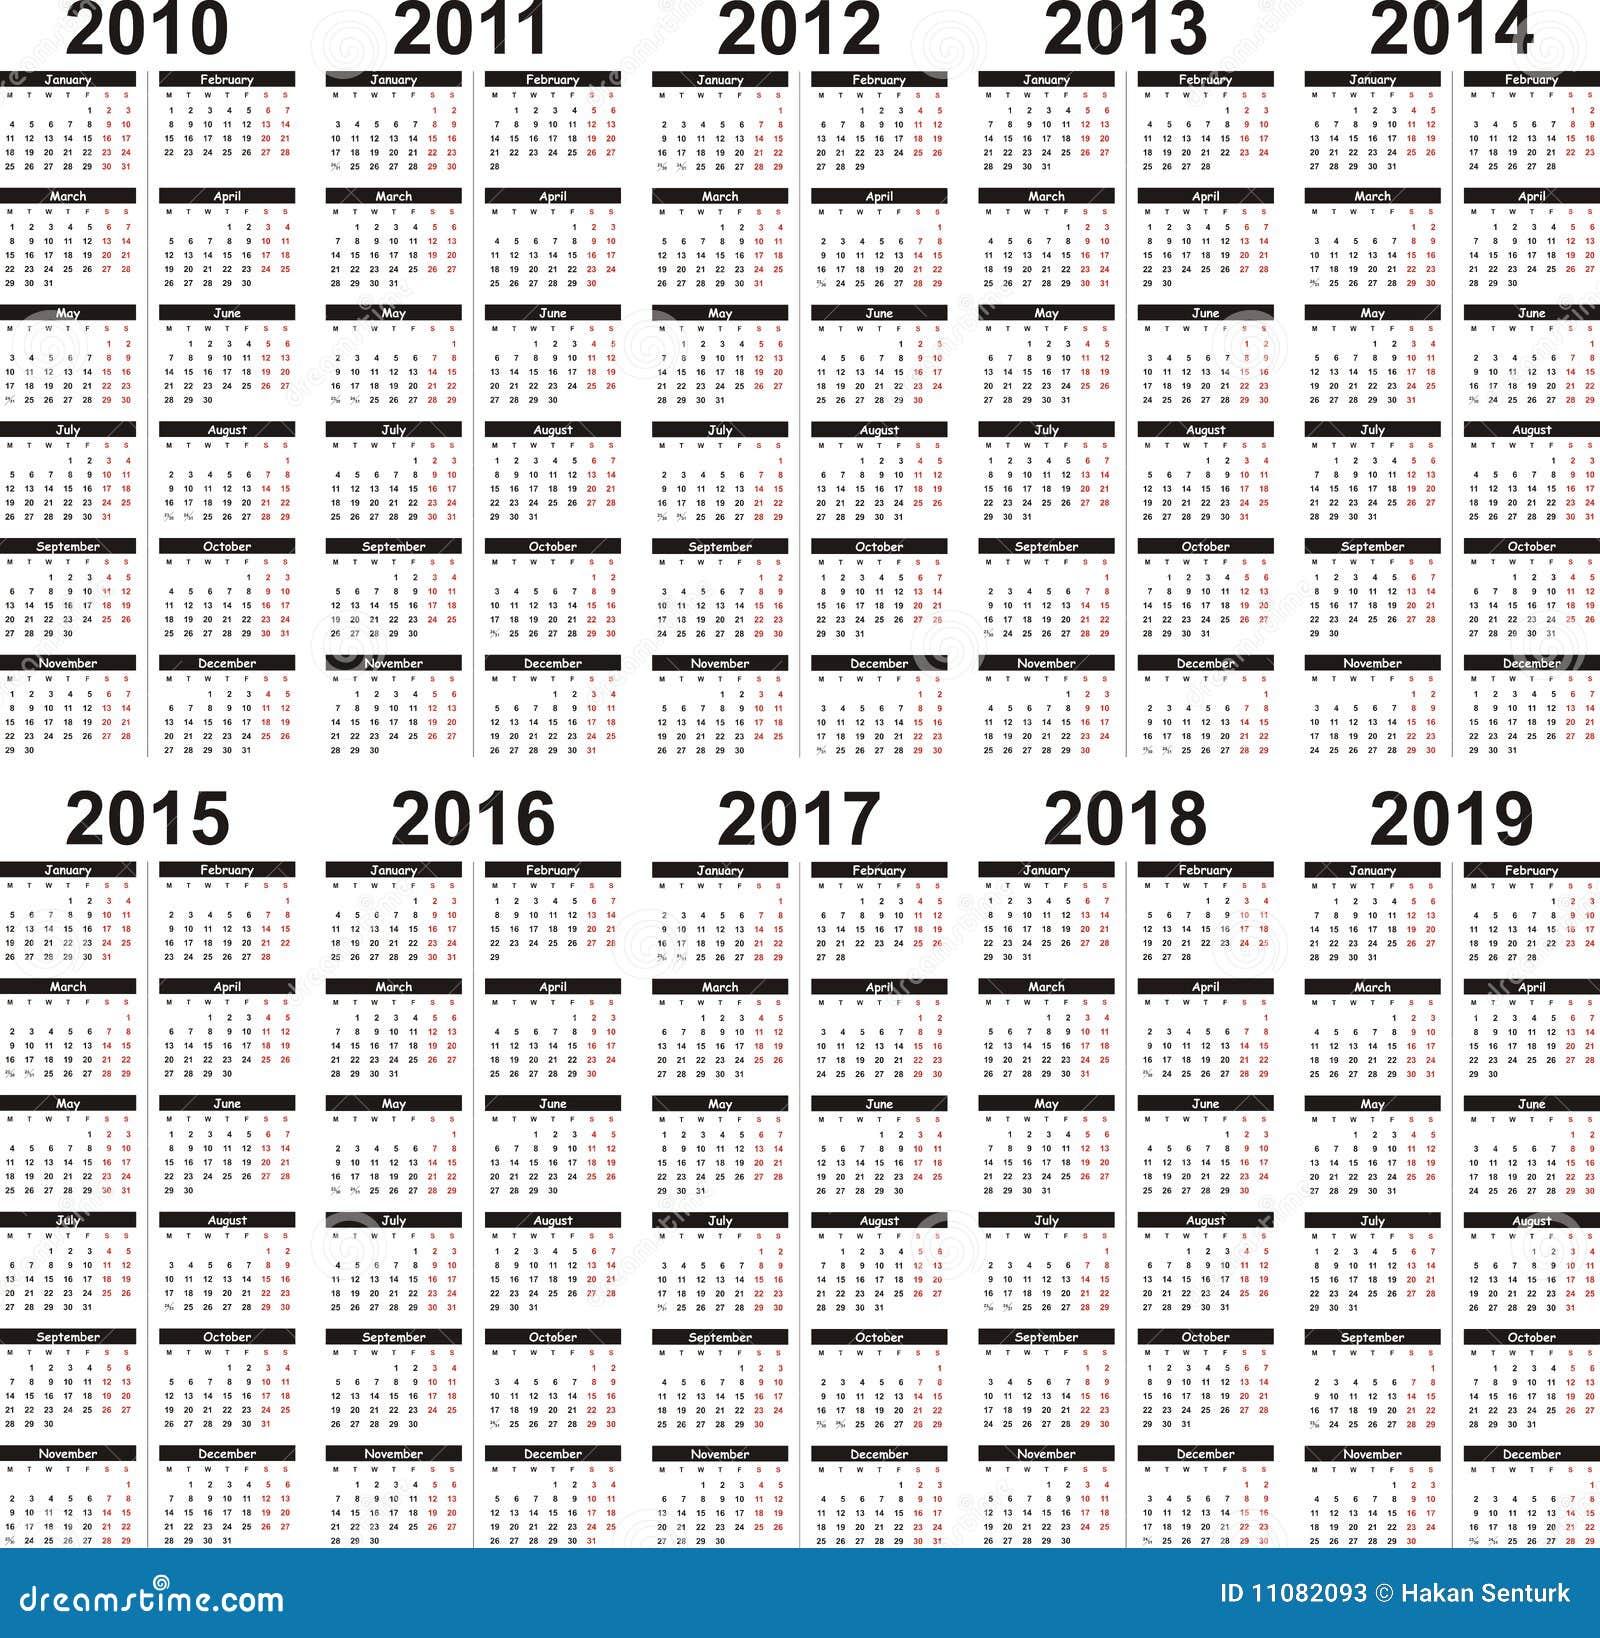 Calendar 2010-2019 Stock Photos - Image: 11082093